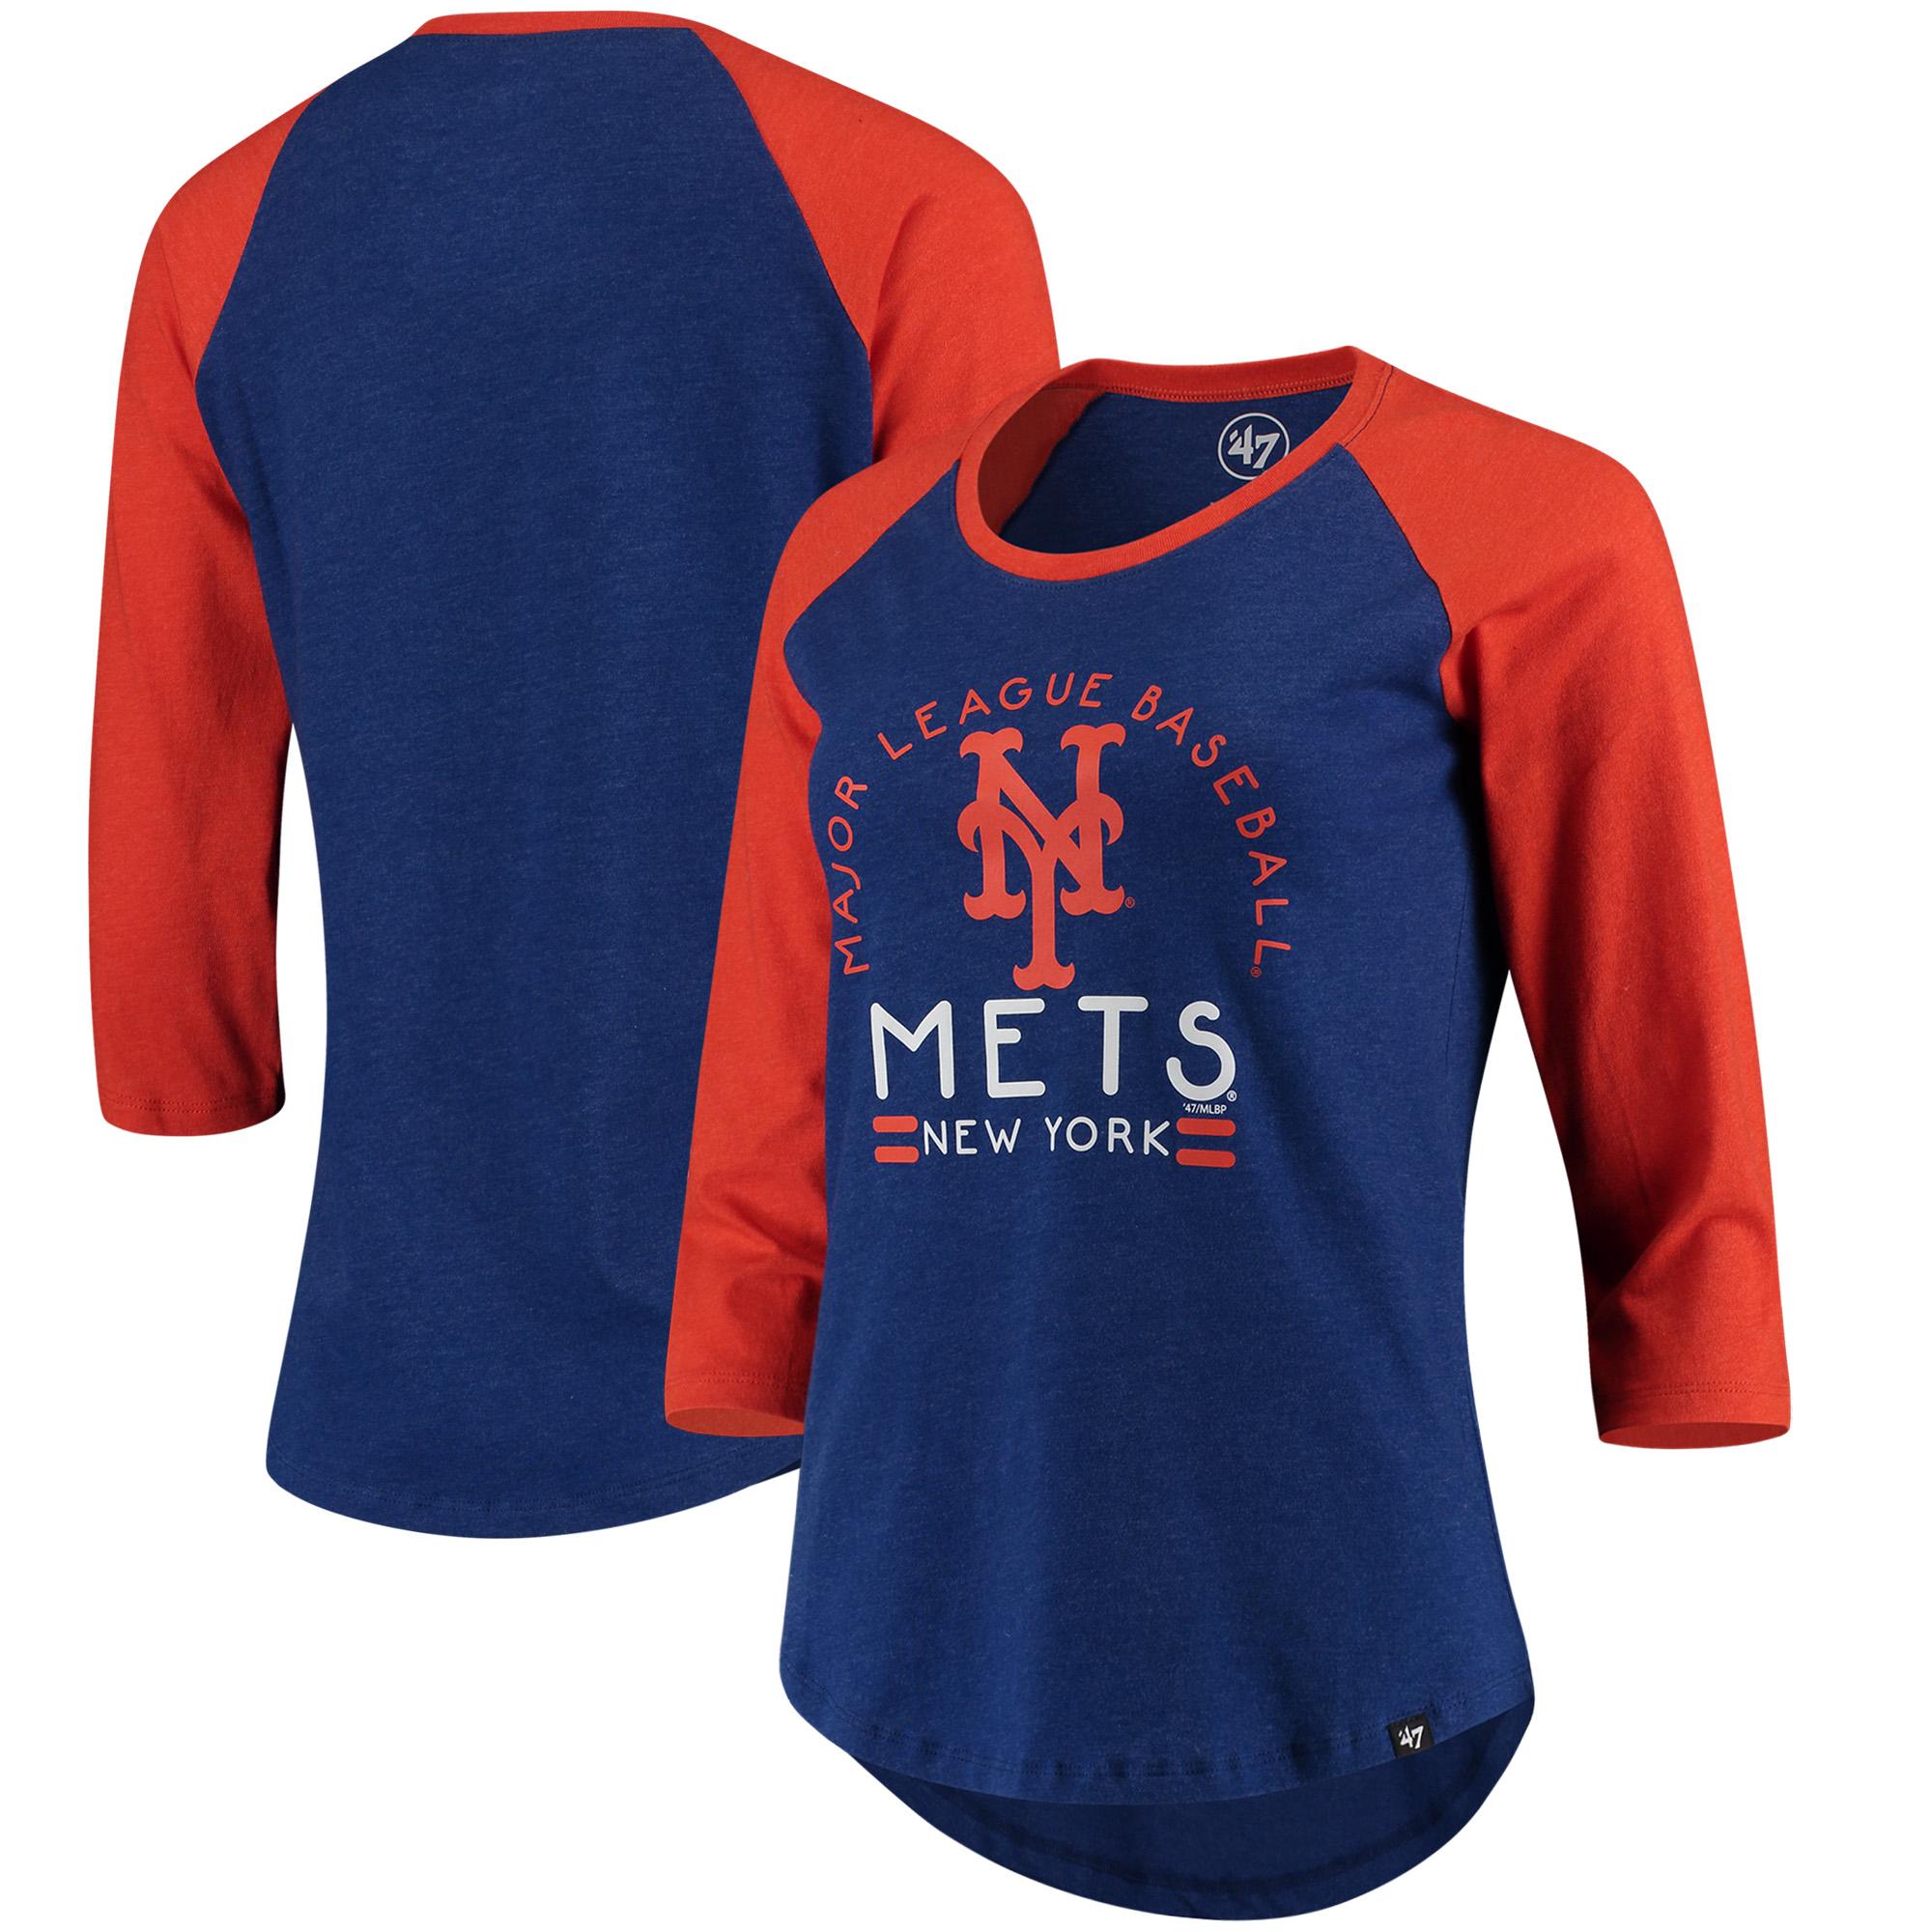 New York Mets '47 Women's Club 3/4-Sleeve Raglan T-Shirt - Heathered Royal